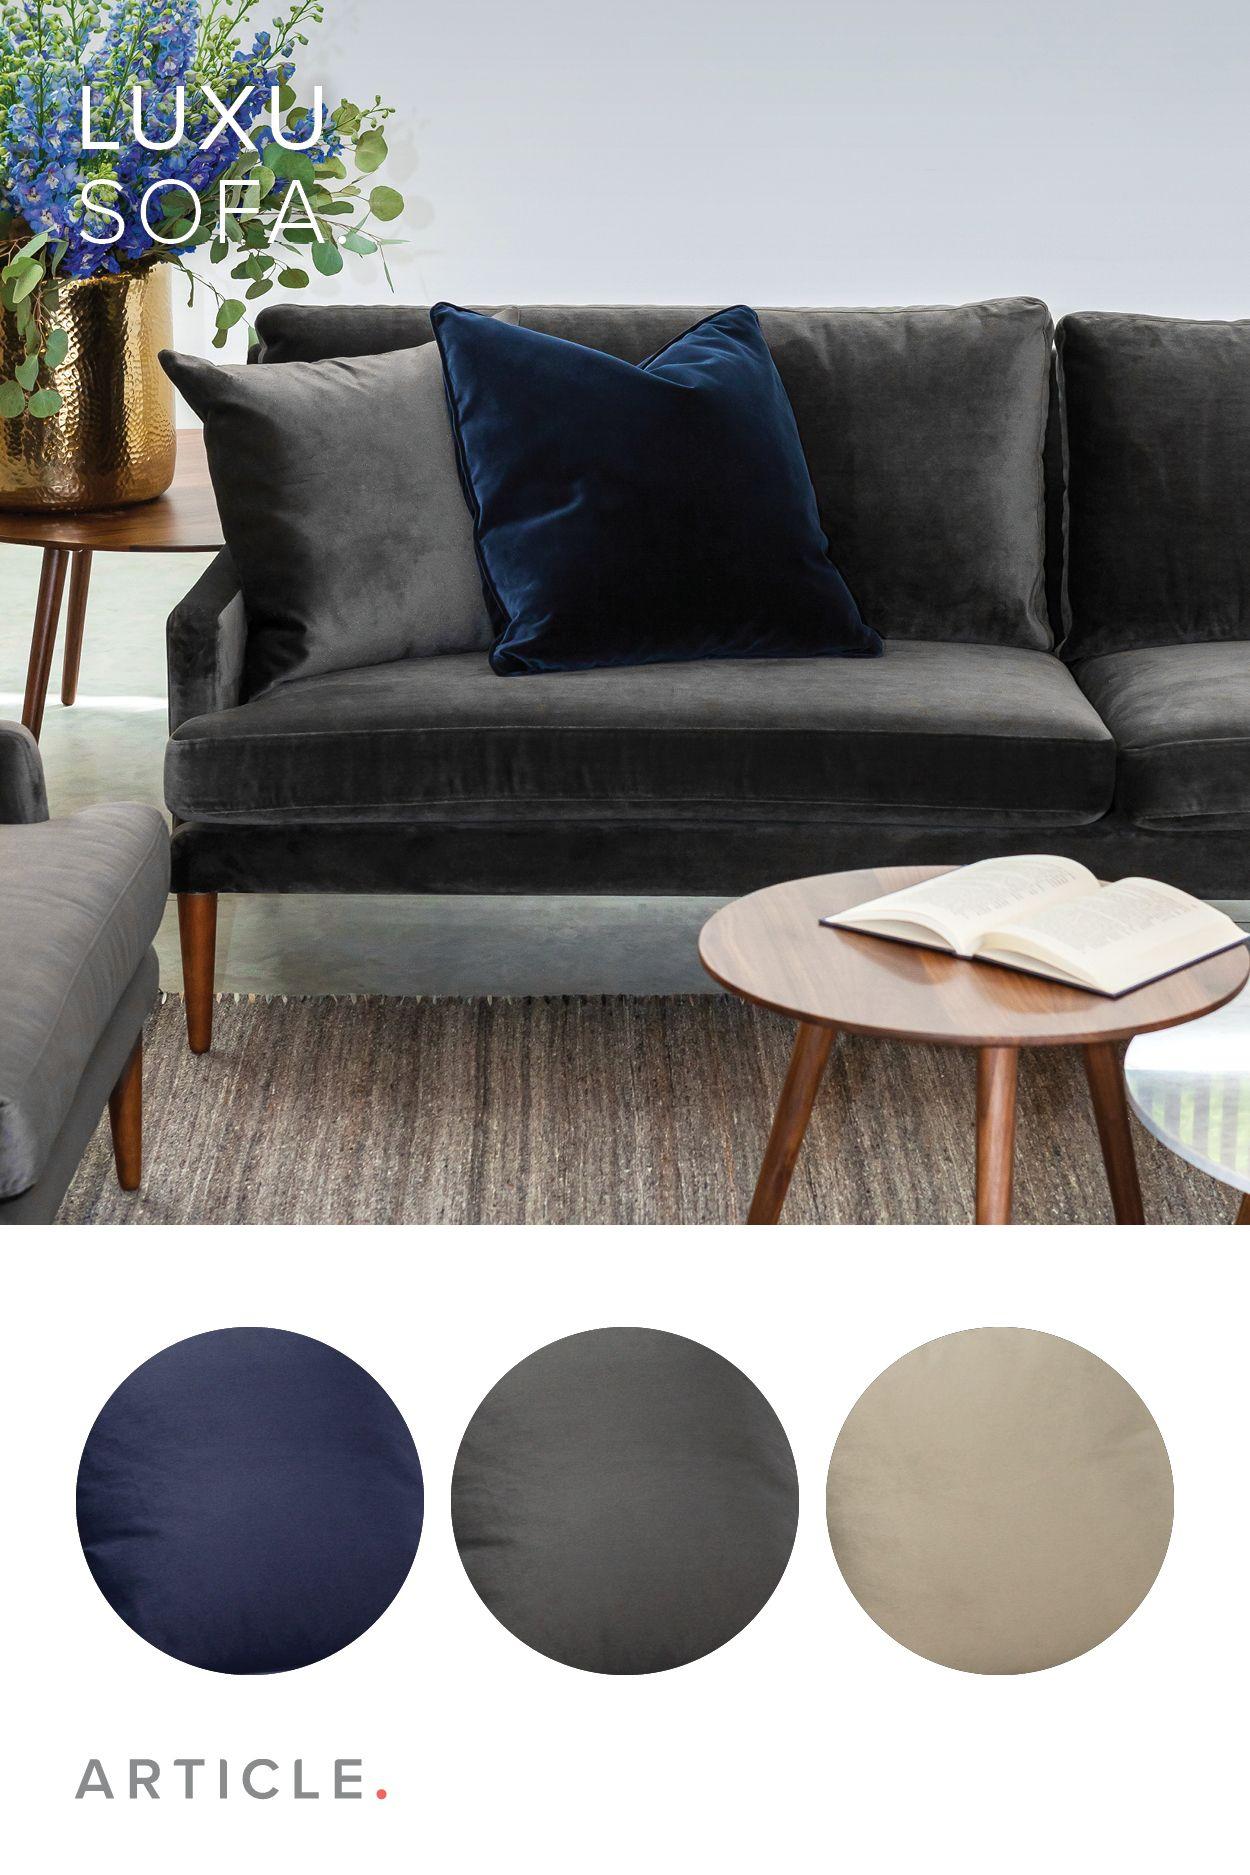 Living Room Pale Grey Sofa Scatter Cushions Pastel Painting Artwork Living Decor Living Room Inspiration Living Room Grey